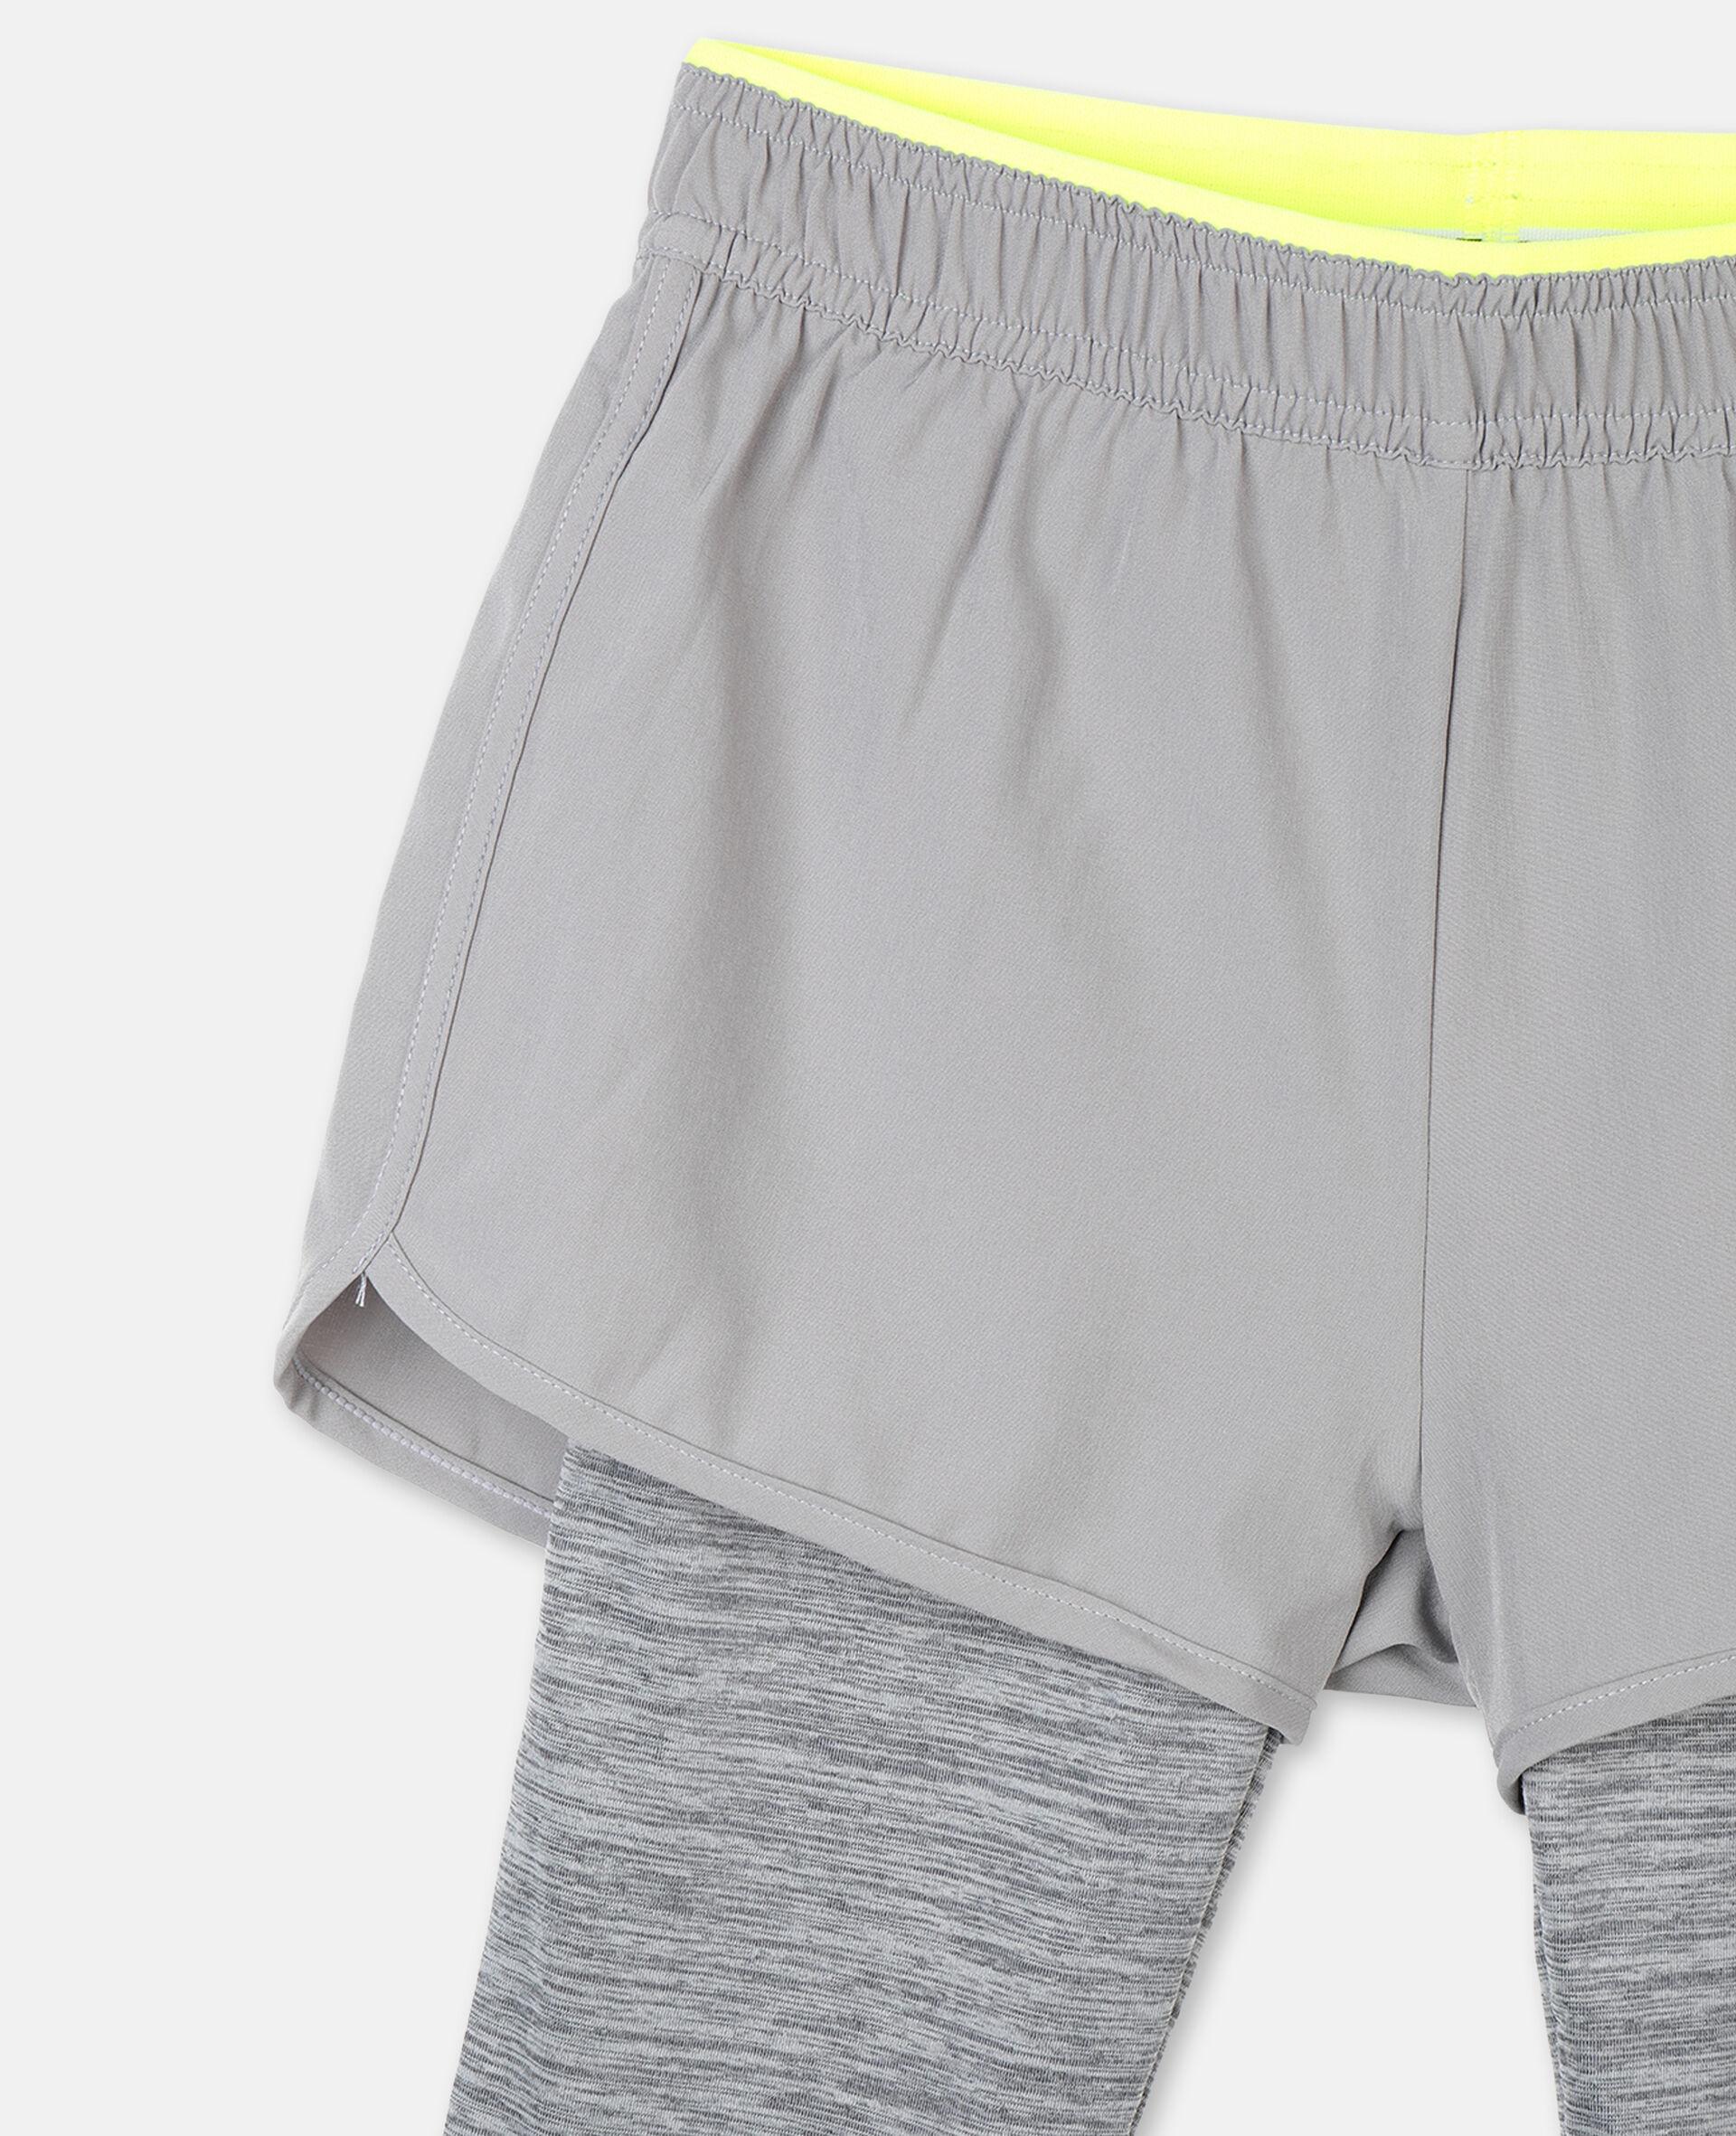 段染运动贴腿裤 -灰色-large image number 1